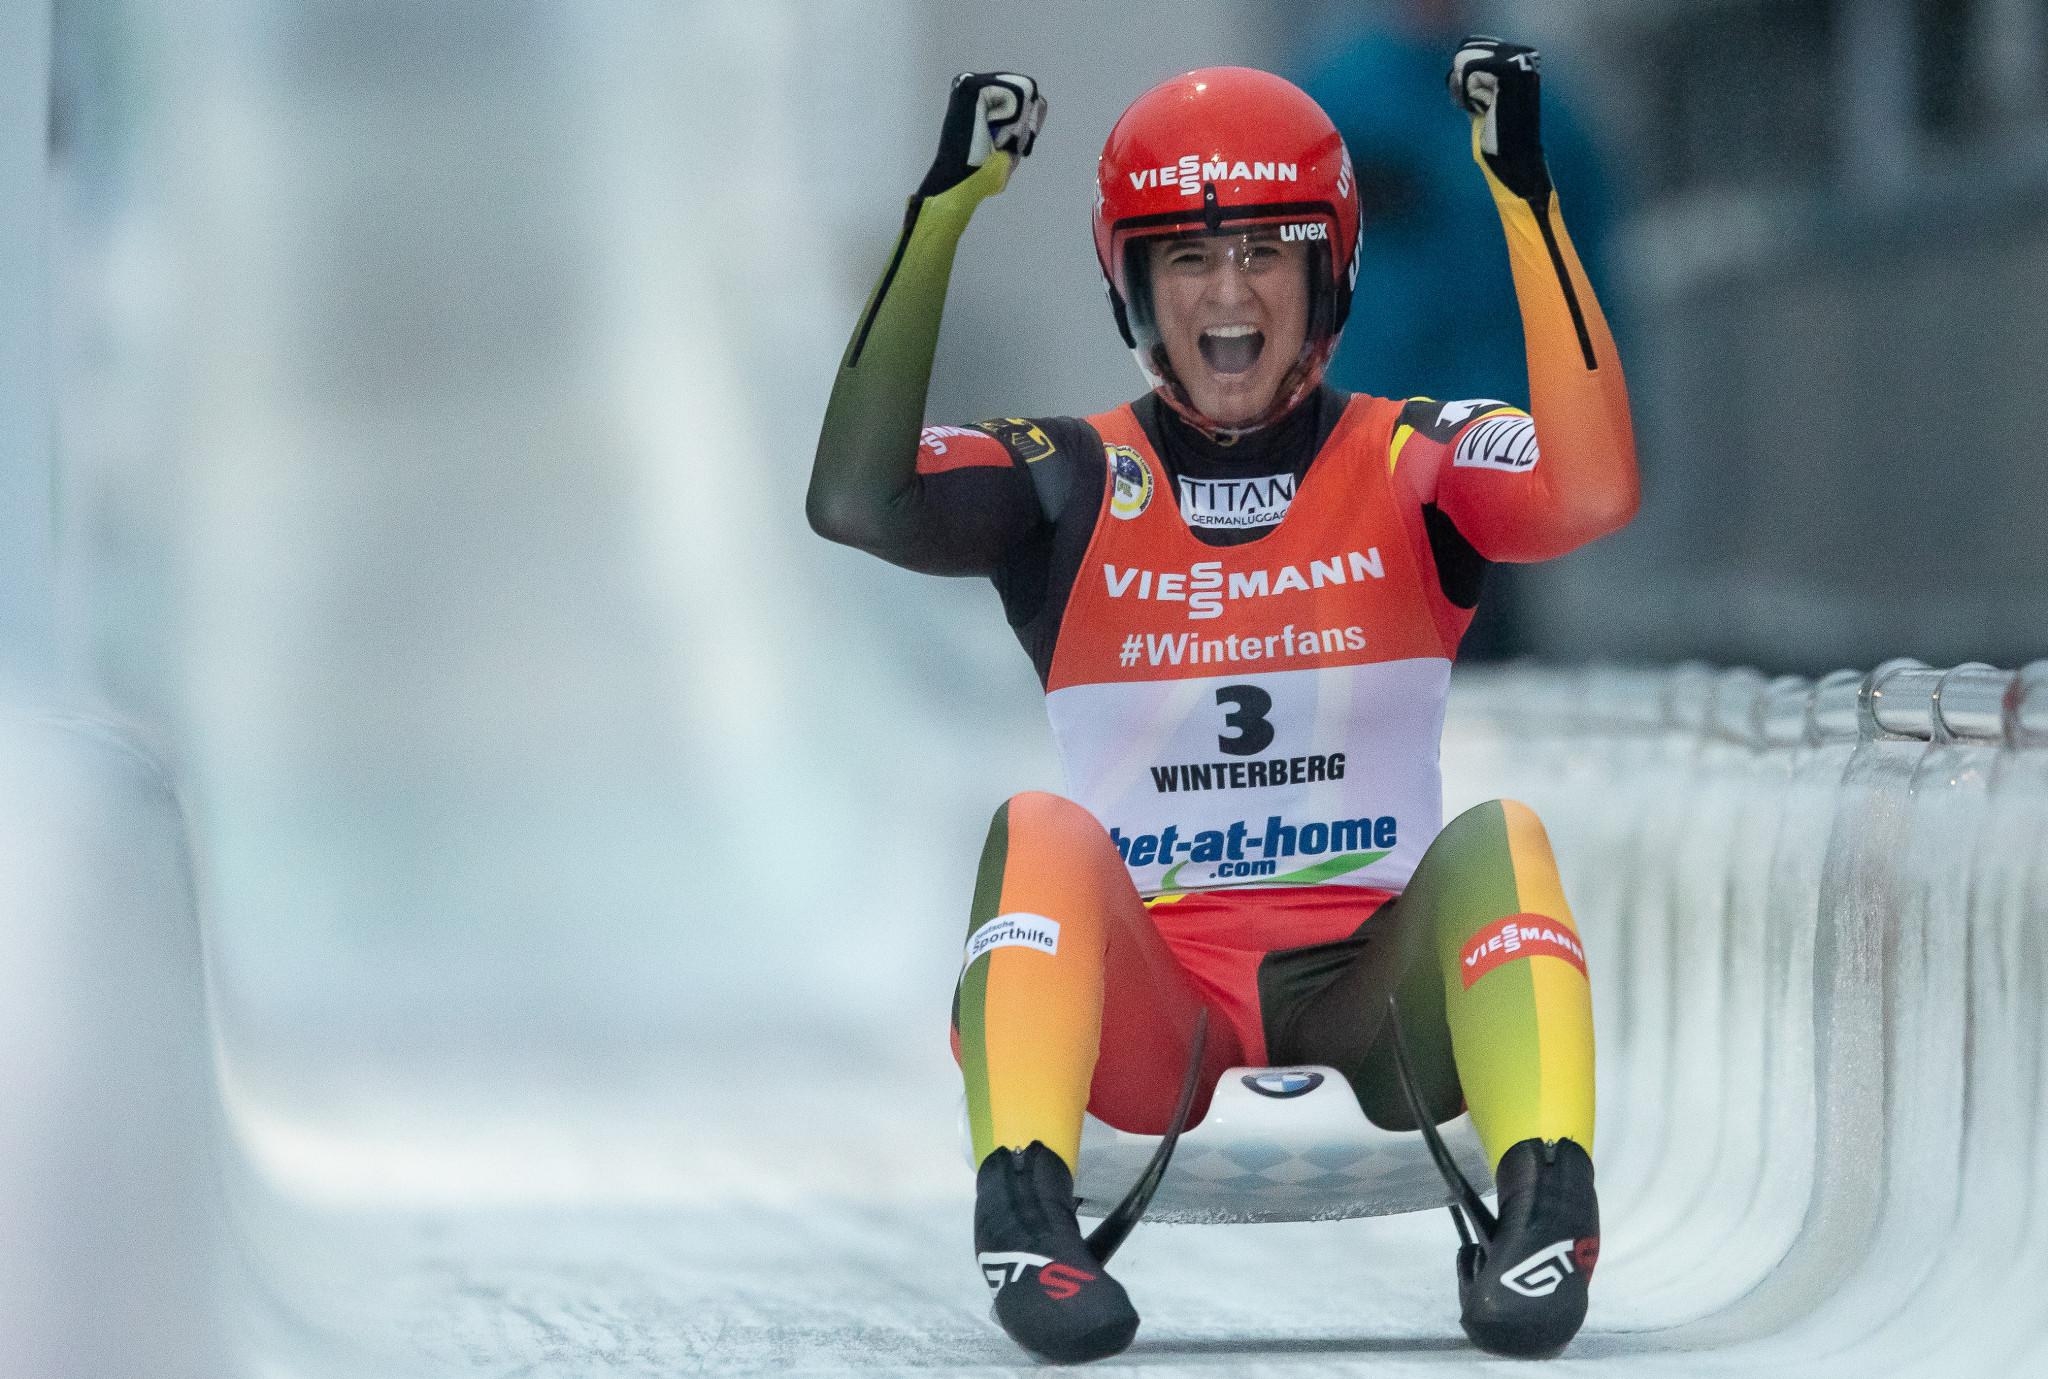 Olympic luge champion Geisenberger to skip upcoming season